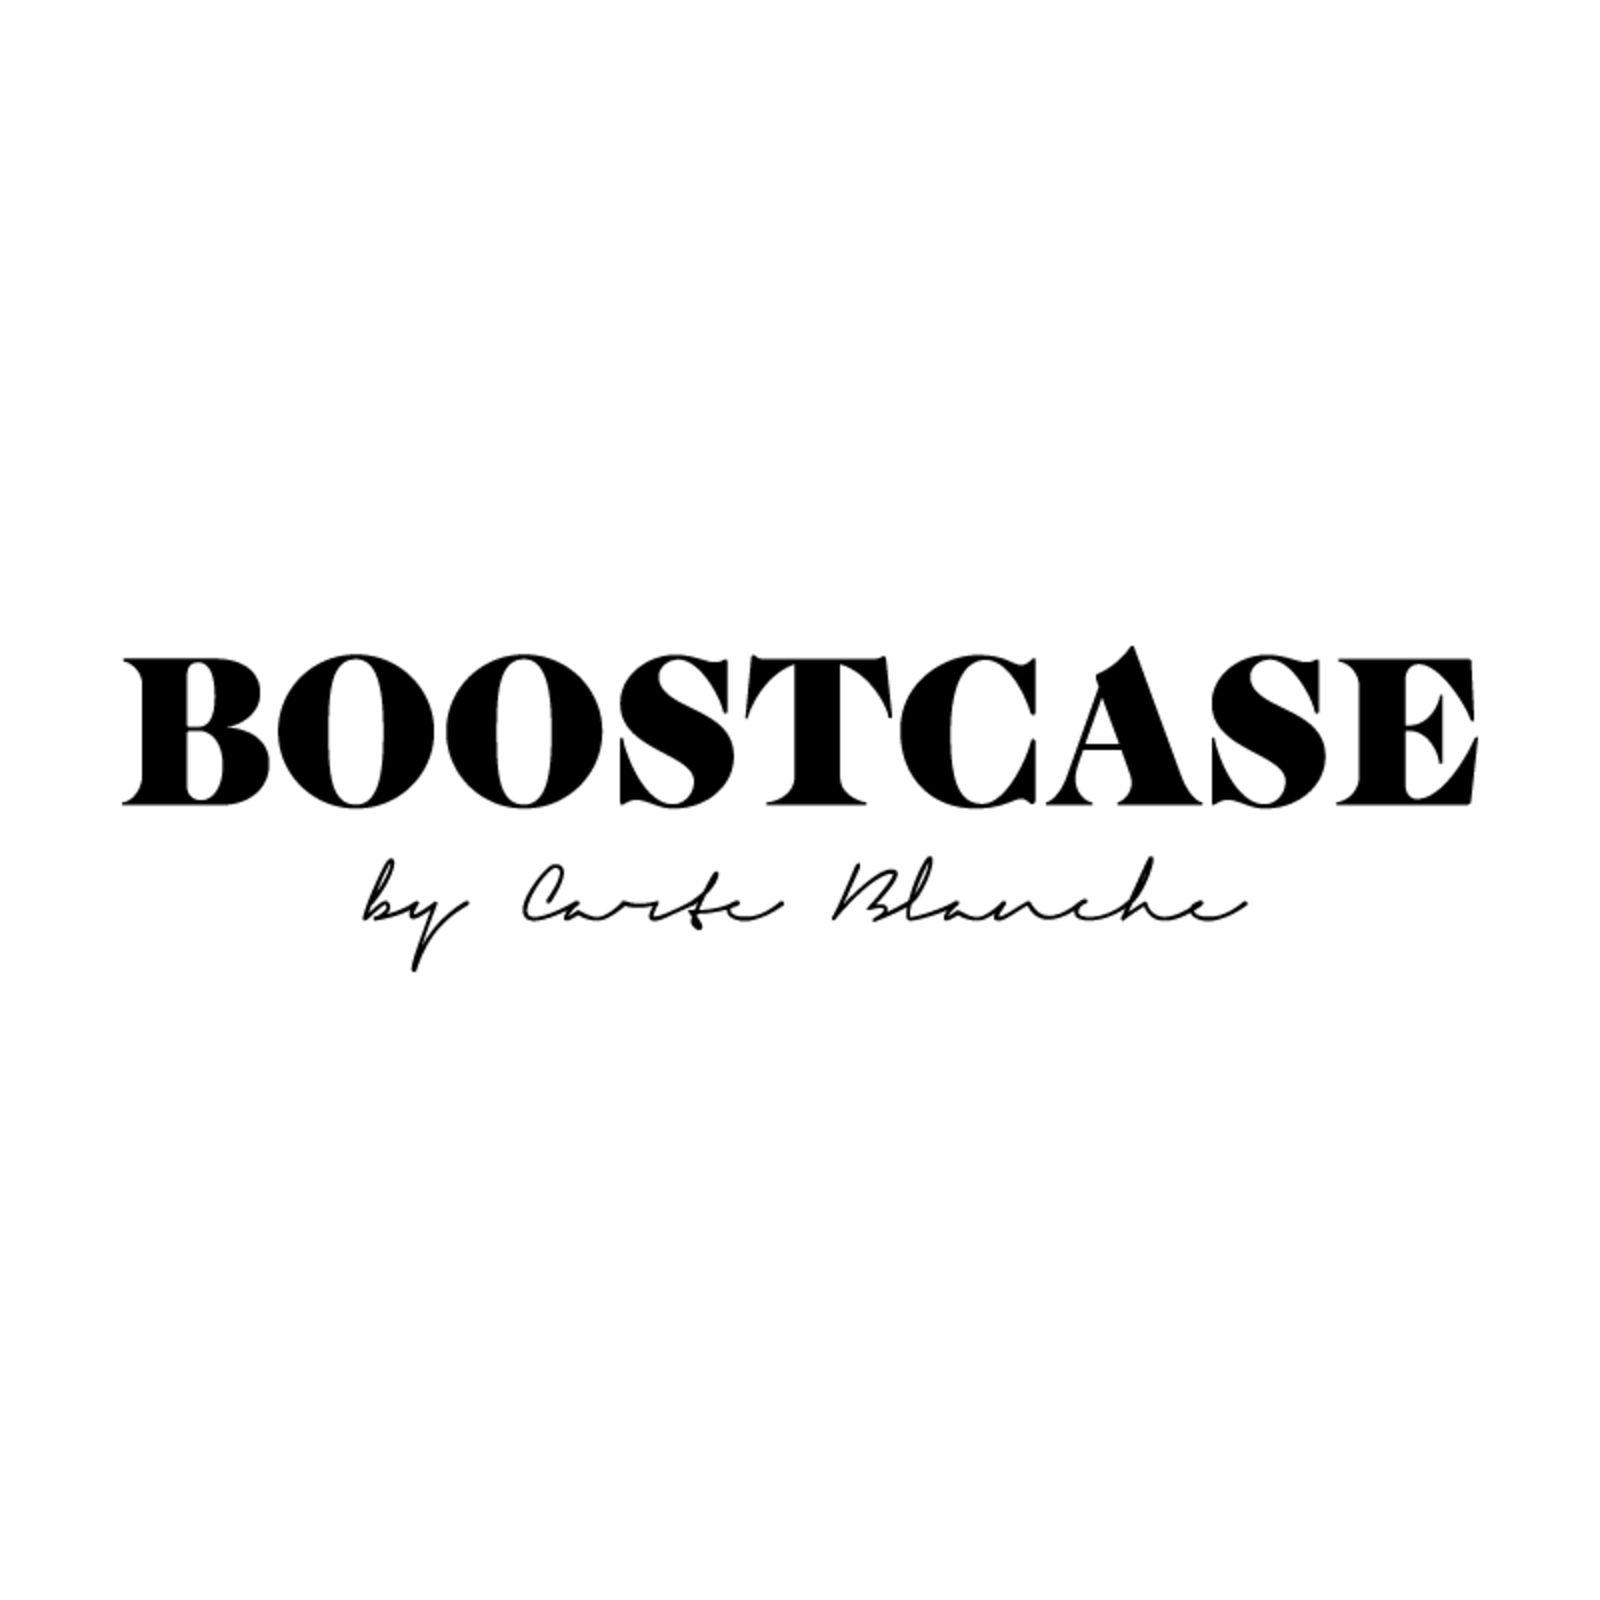 BOOSTCASE